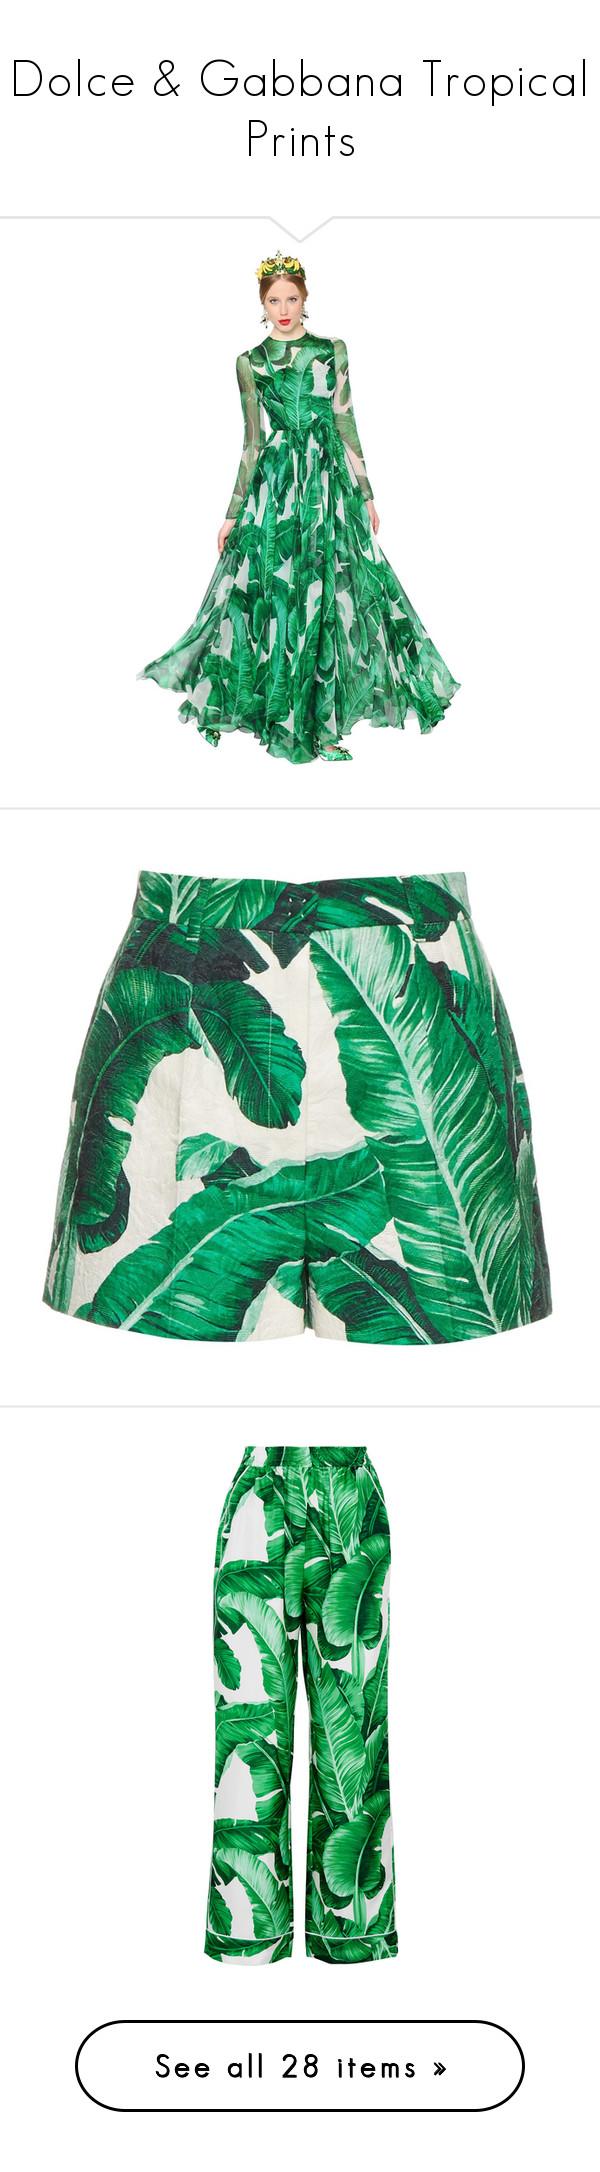 Dolce u gabbana tropical prints